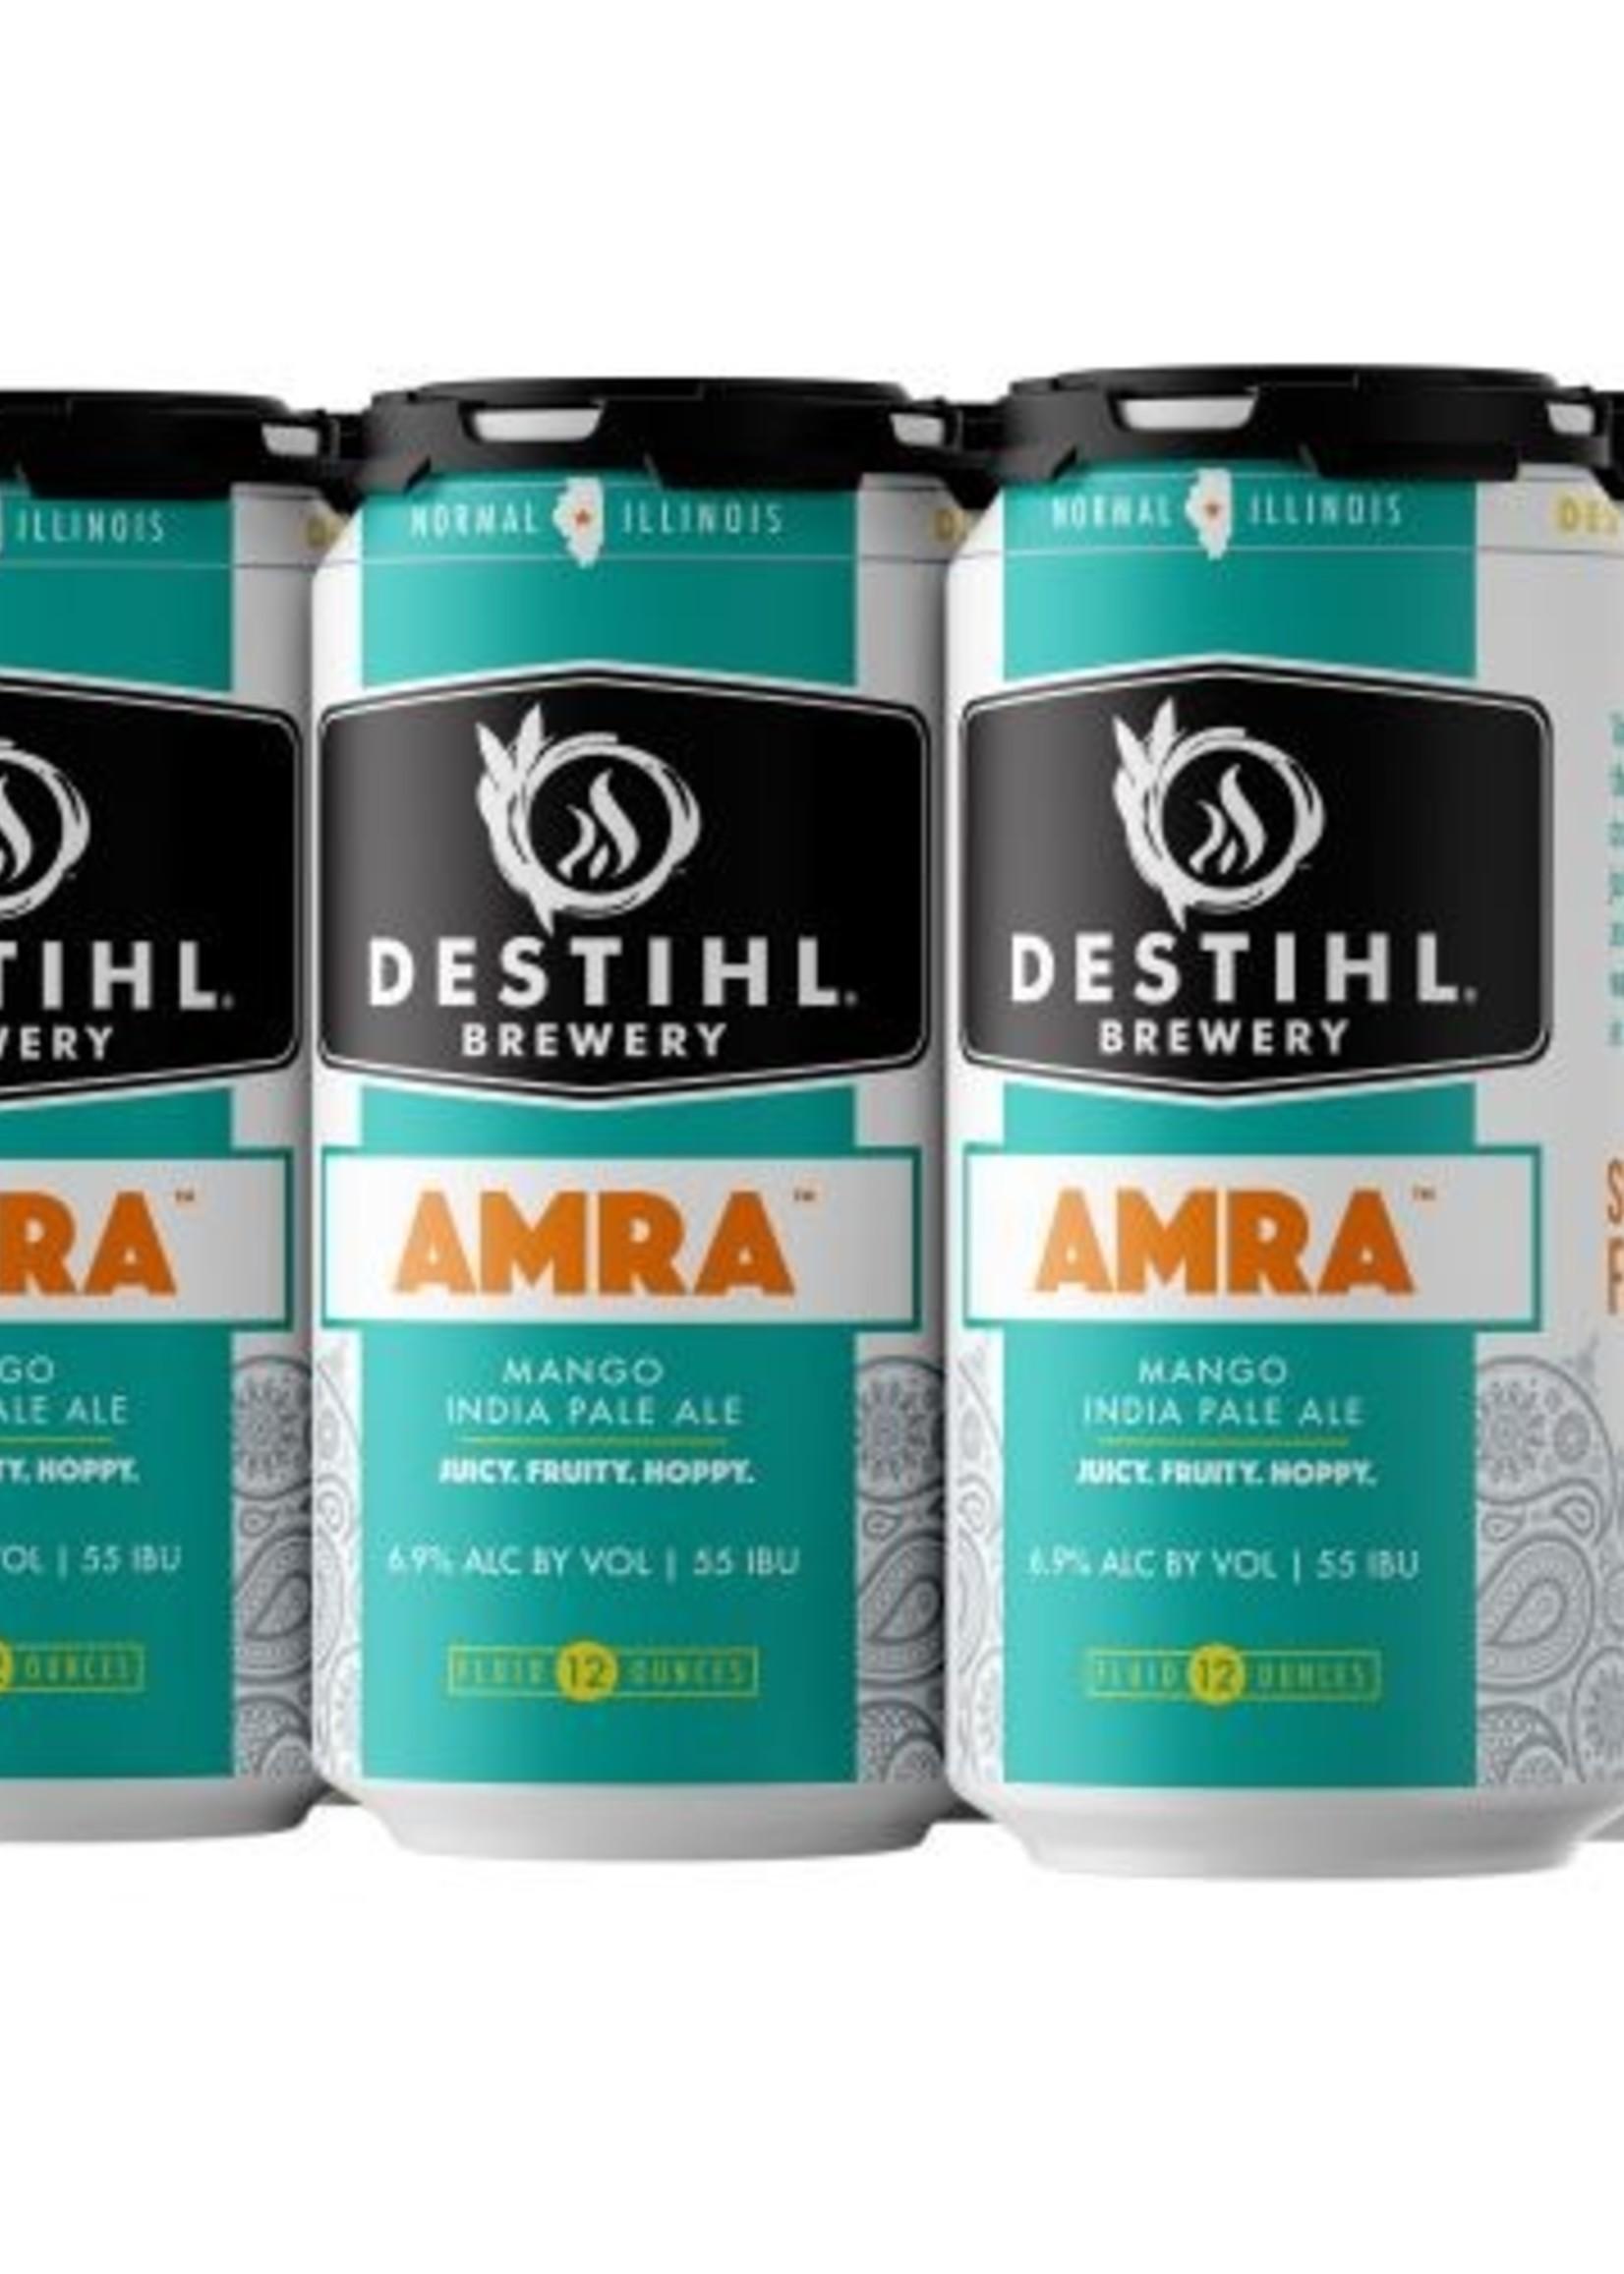 Destihl AMRA Mango IPA - 6x12oz Cans